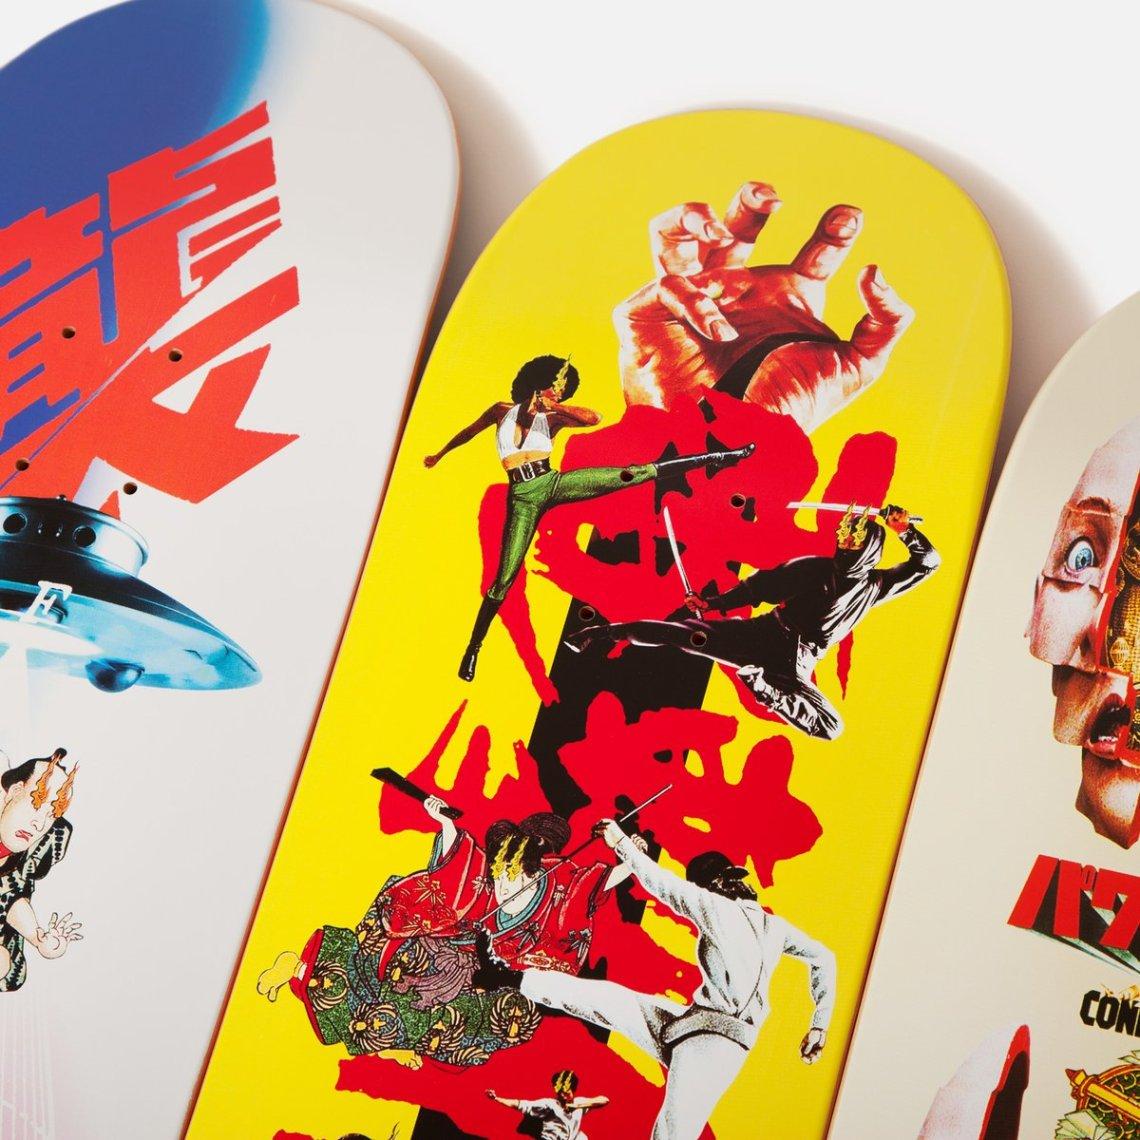 Power Play Series Evisen Skateboards 1